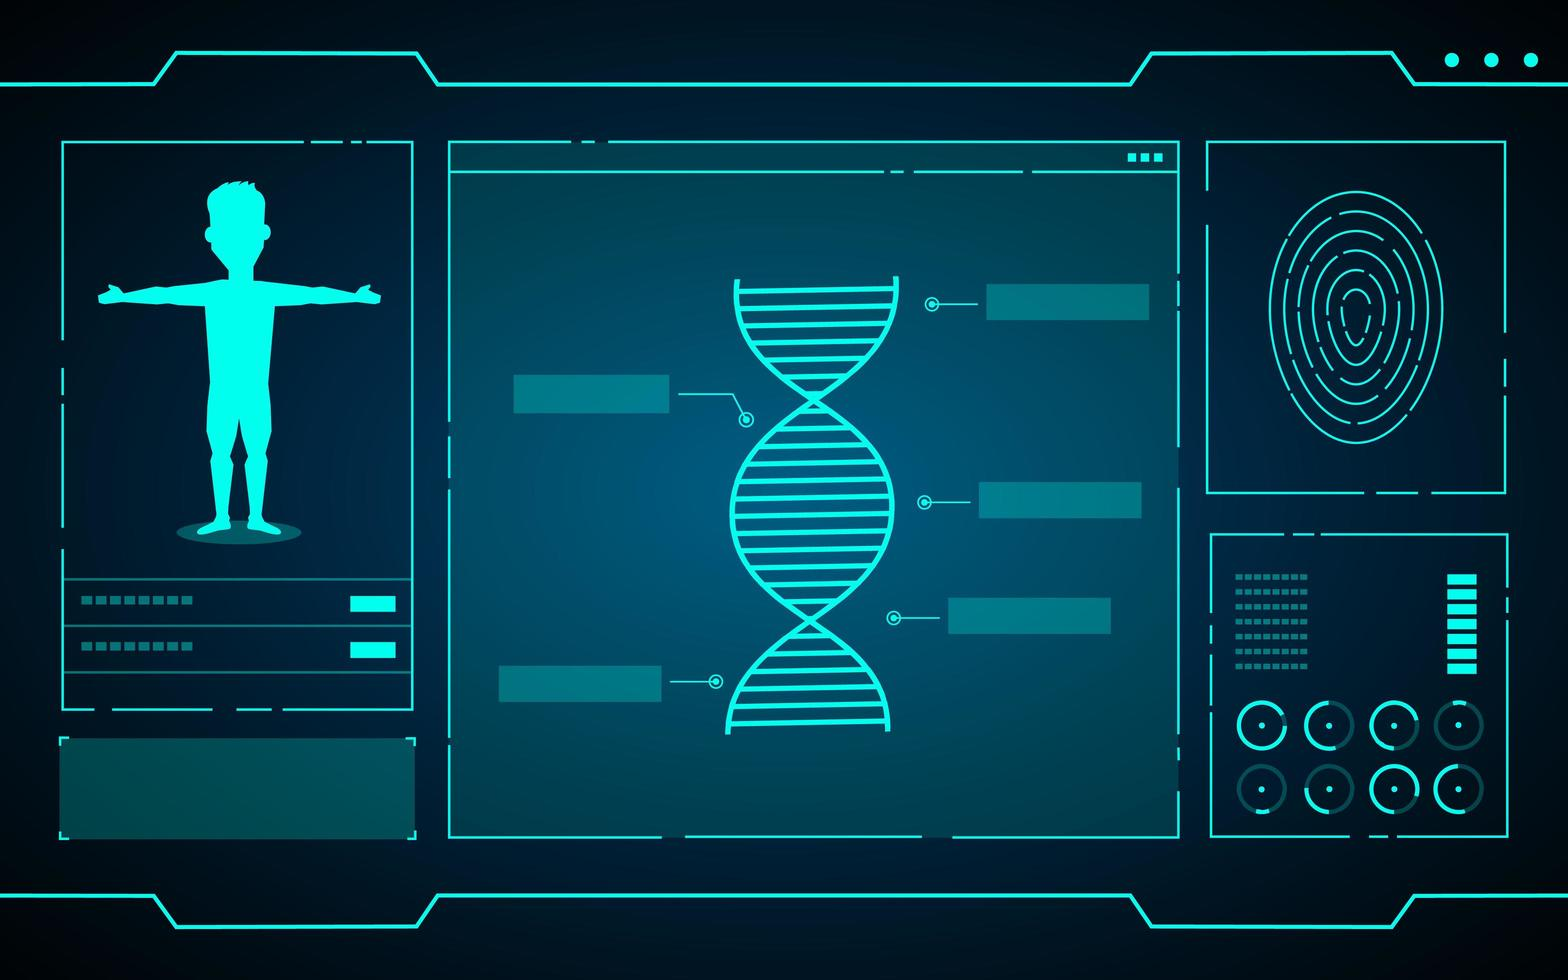 dados científicos sobre tecnologia futurística de computadores vetor